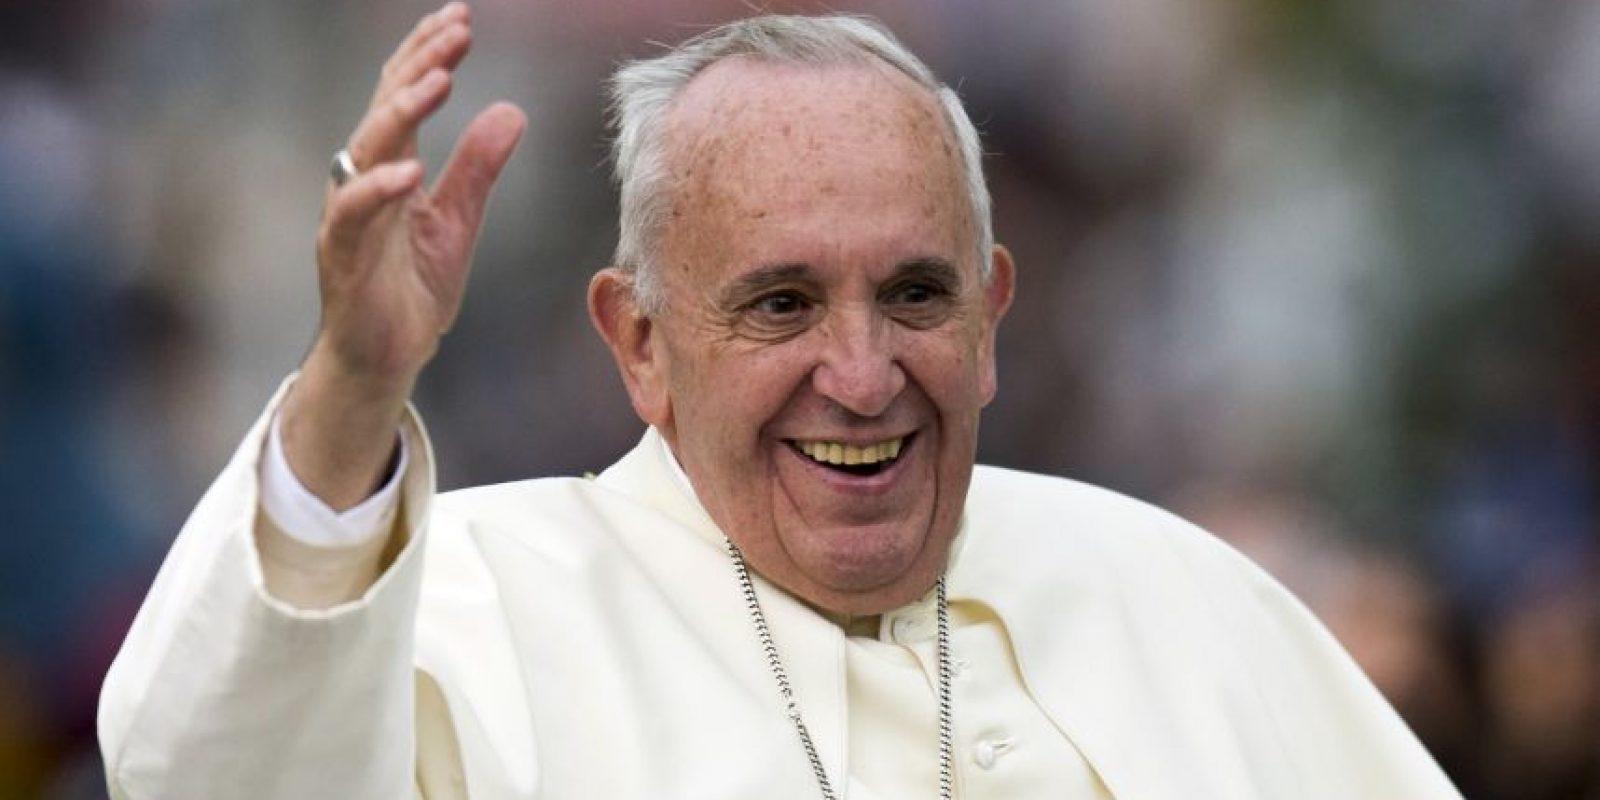 El papa Francisco llegó a Ecuador, como primer destino en su gira por Latinoámerica. Foto:AFP